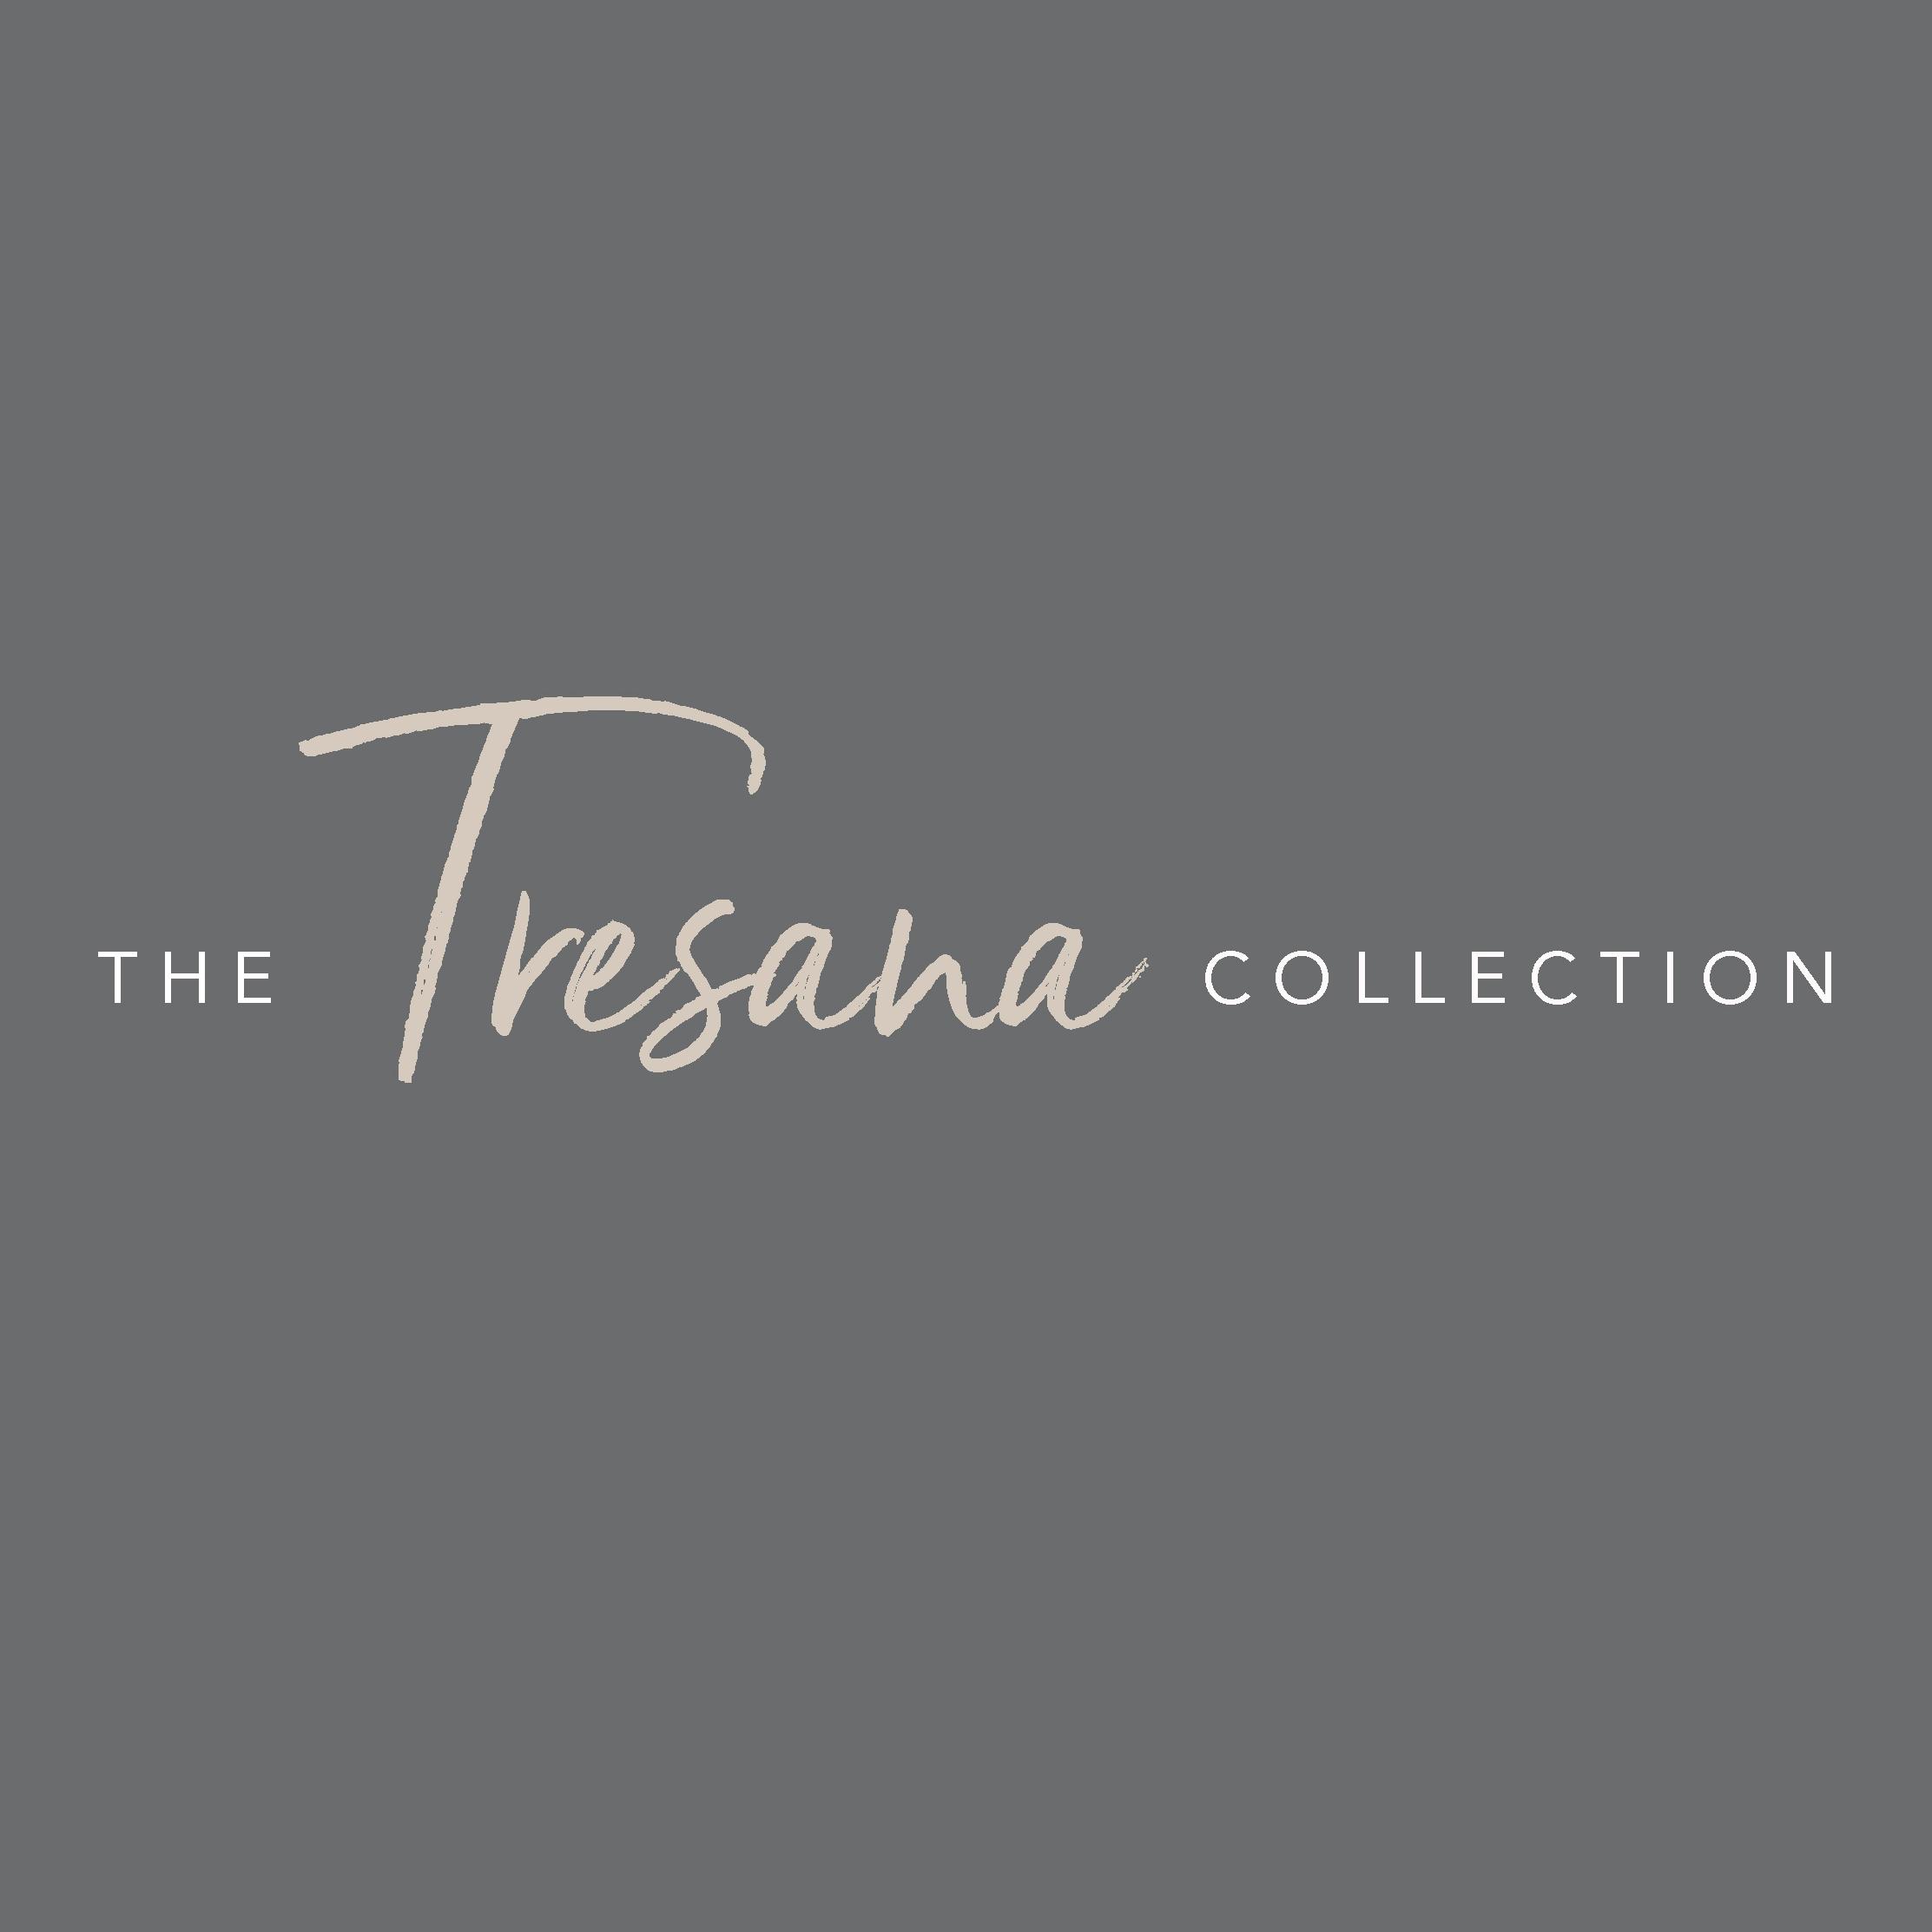 SQUARE THE Tresana COLLECTION logo.jpg